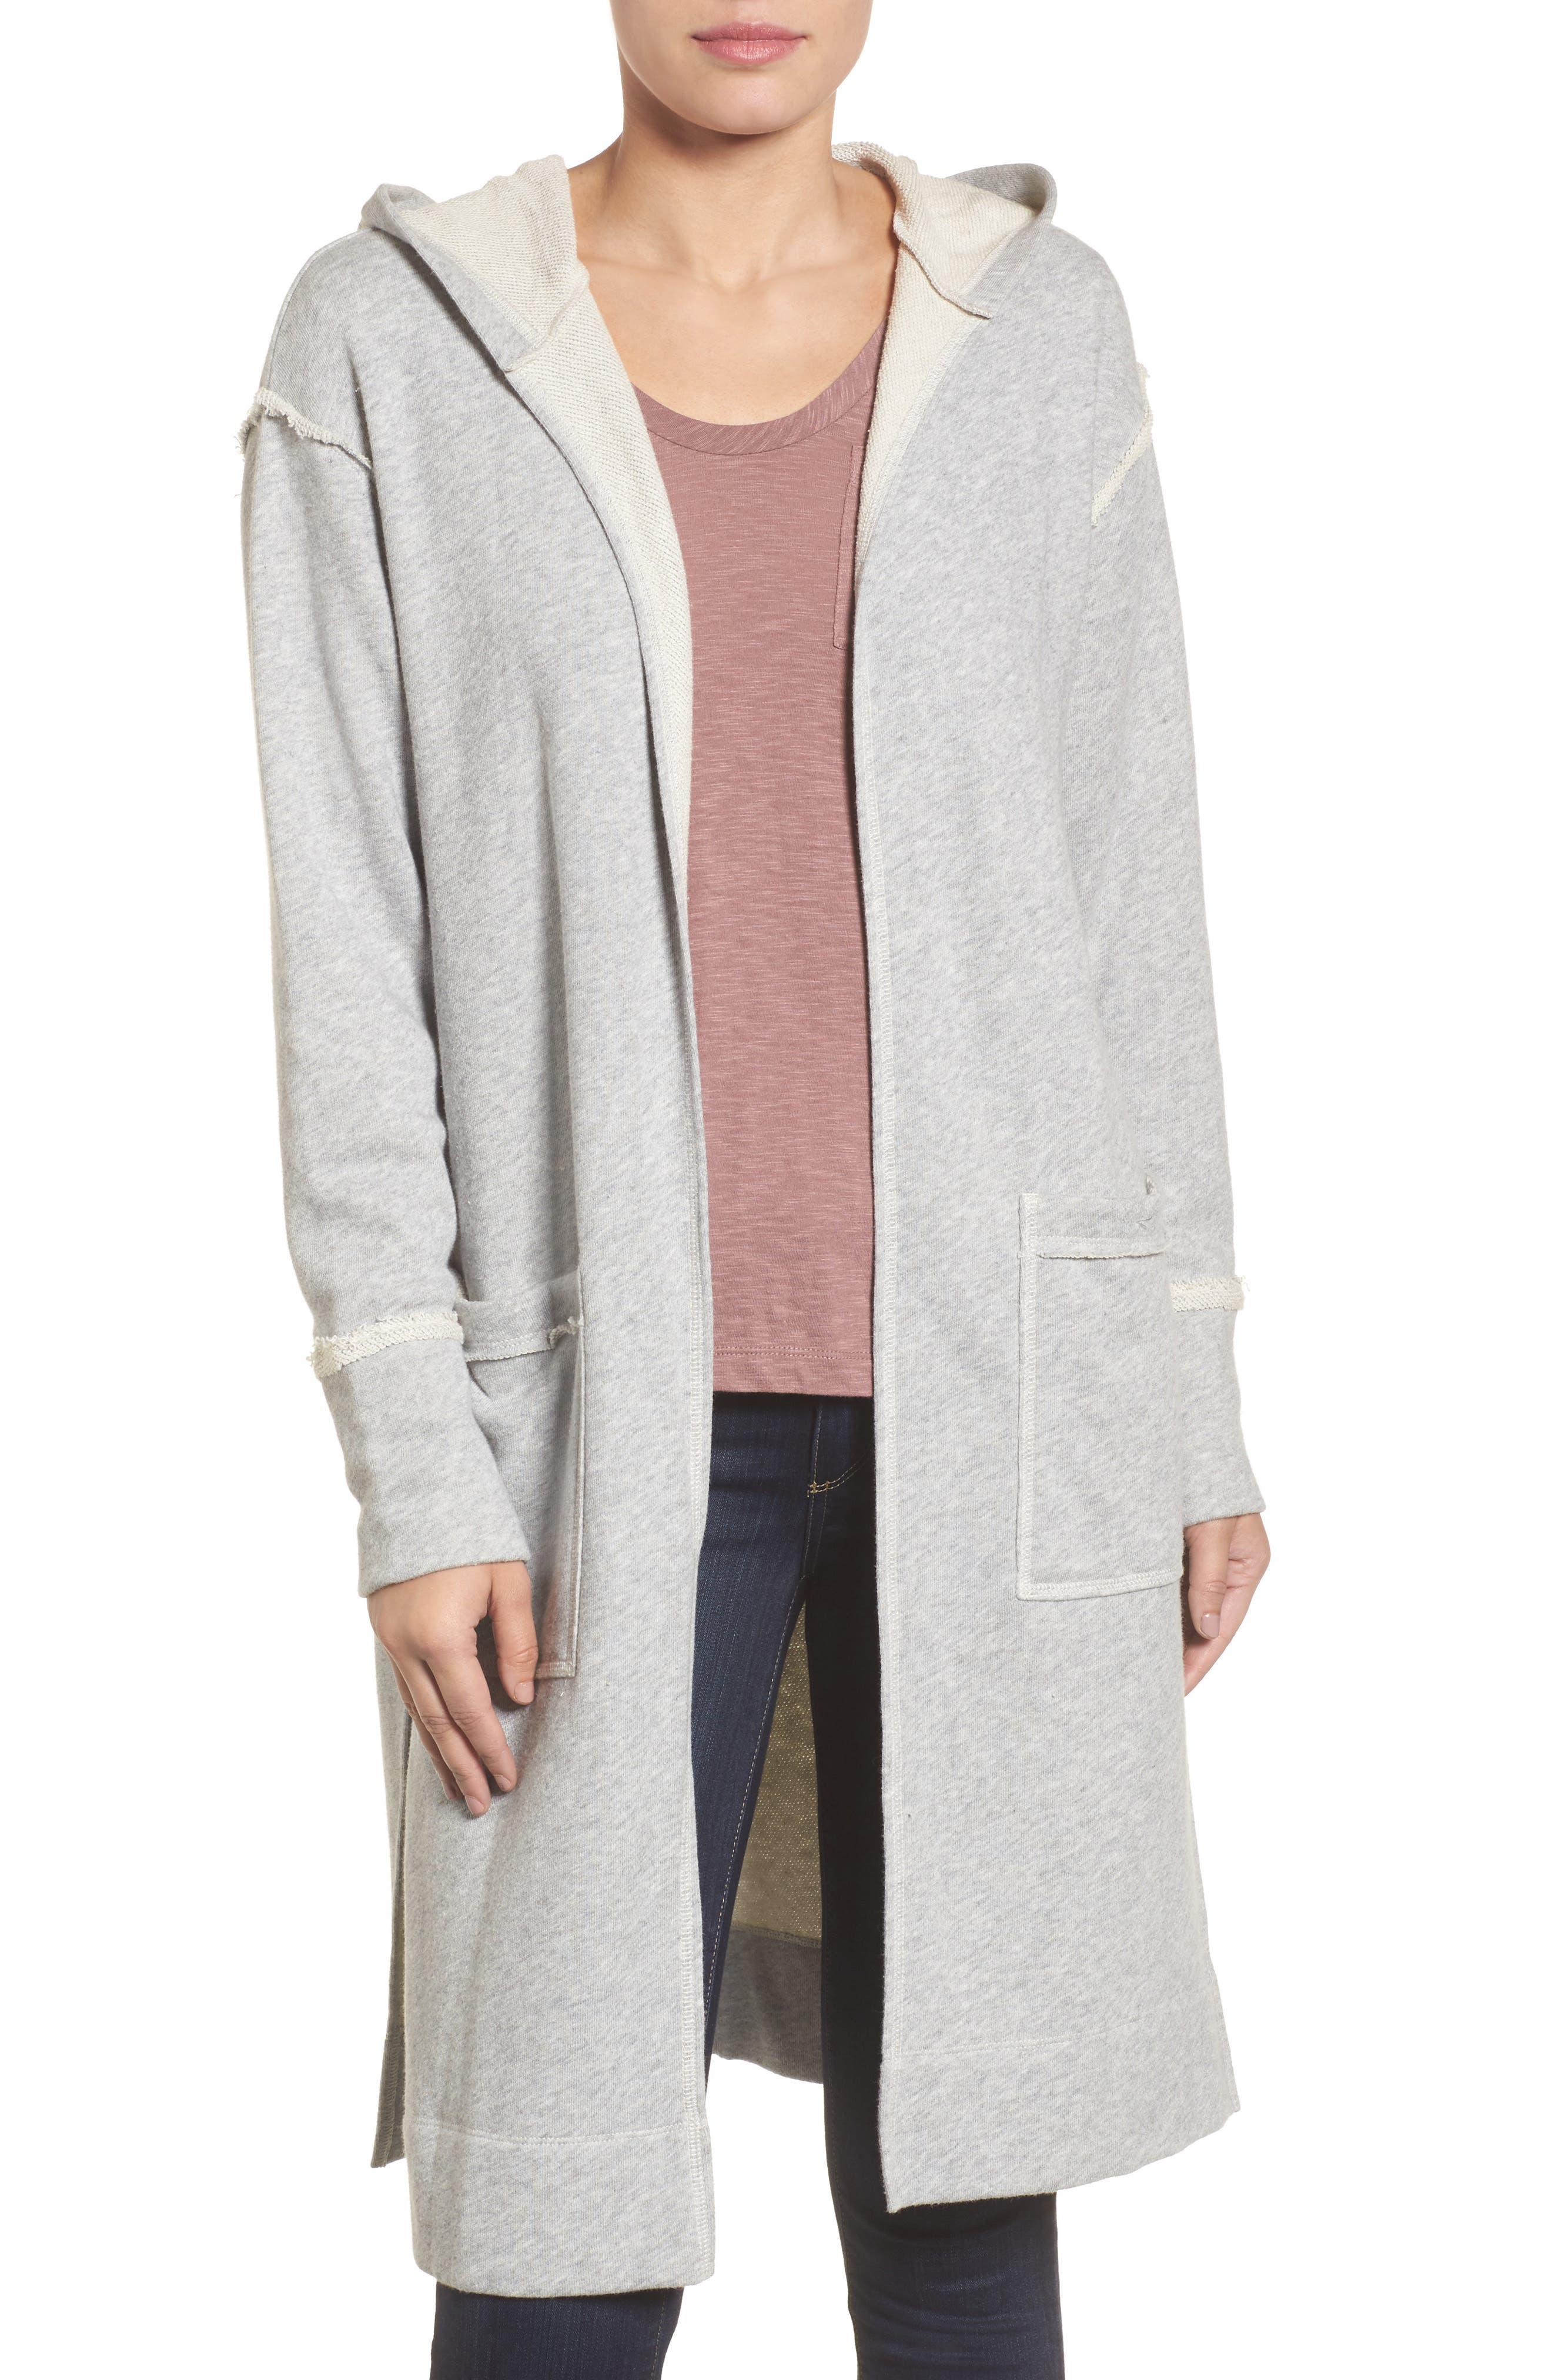 Hooded Long Cardigan,                             Main thumbnail 1, color,                             Grey Heather